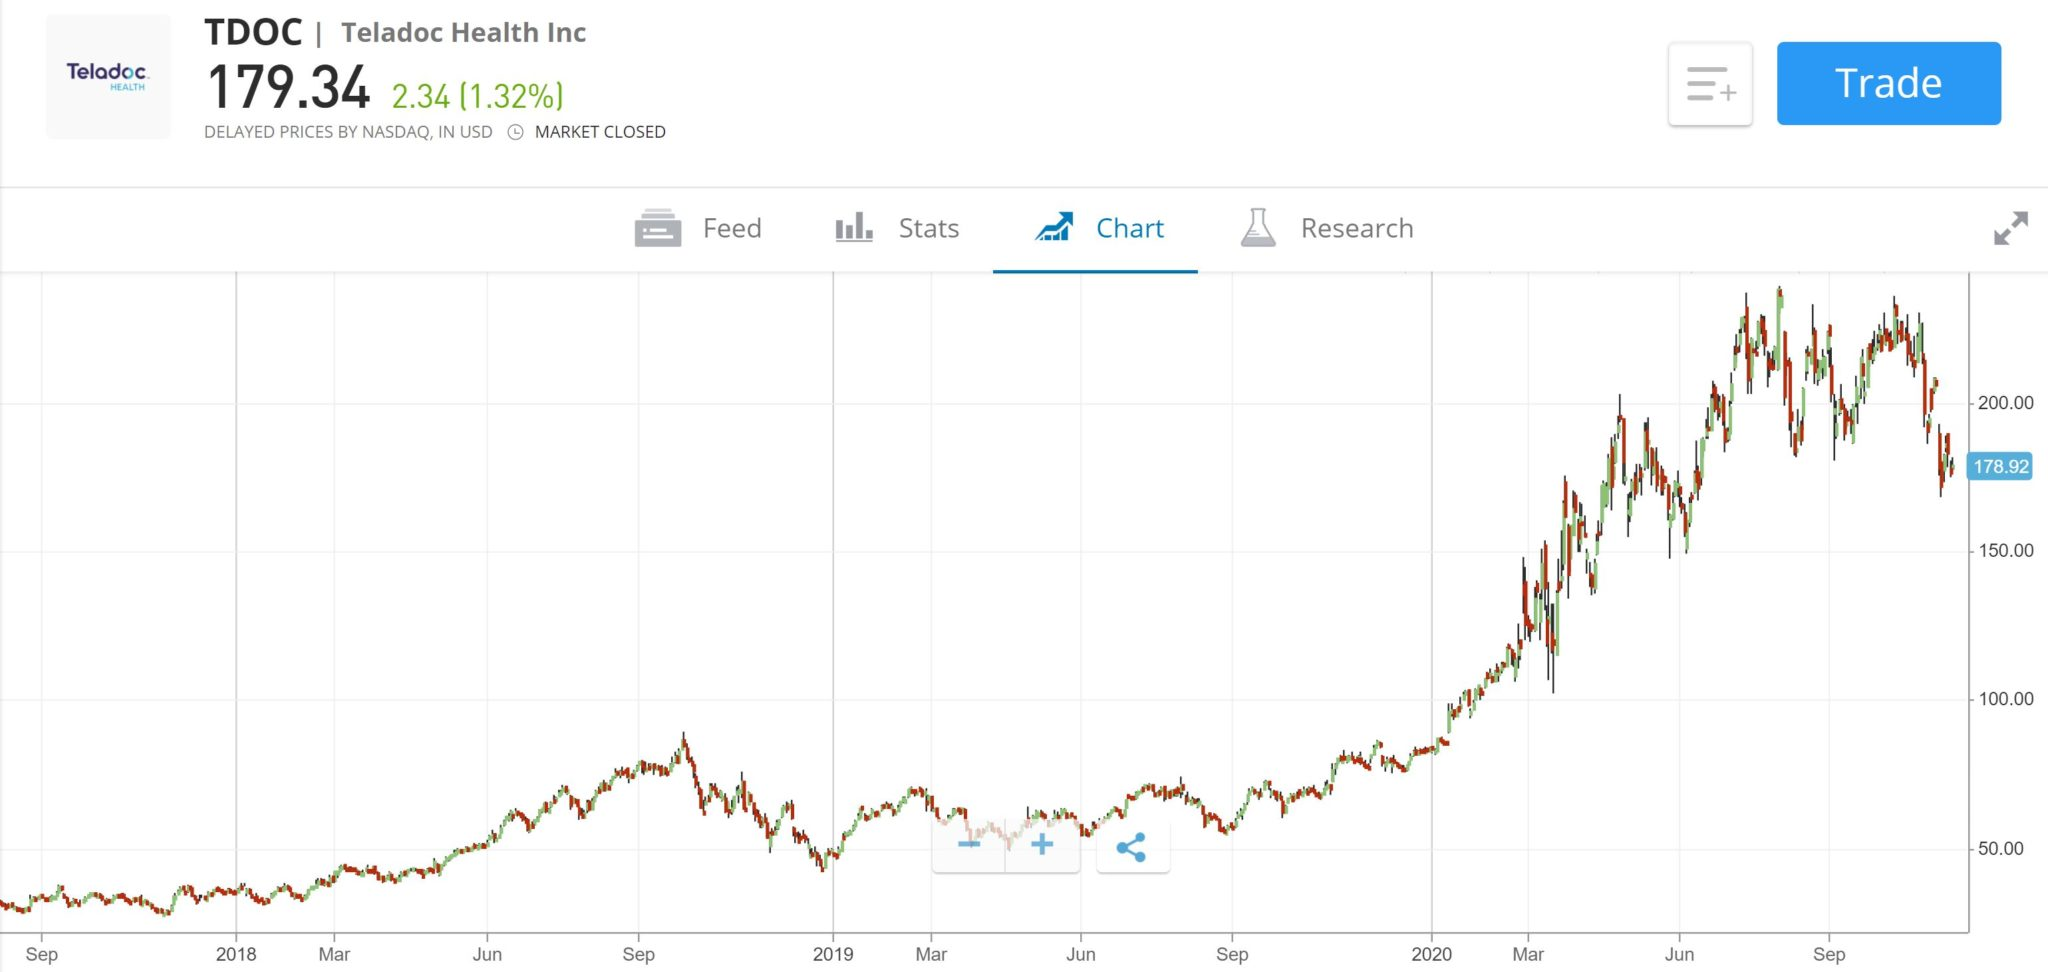 Teladoc Stock Price Chart eToro